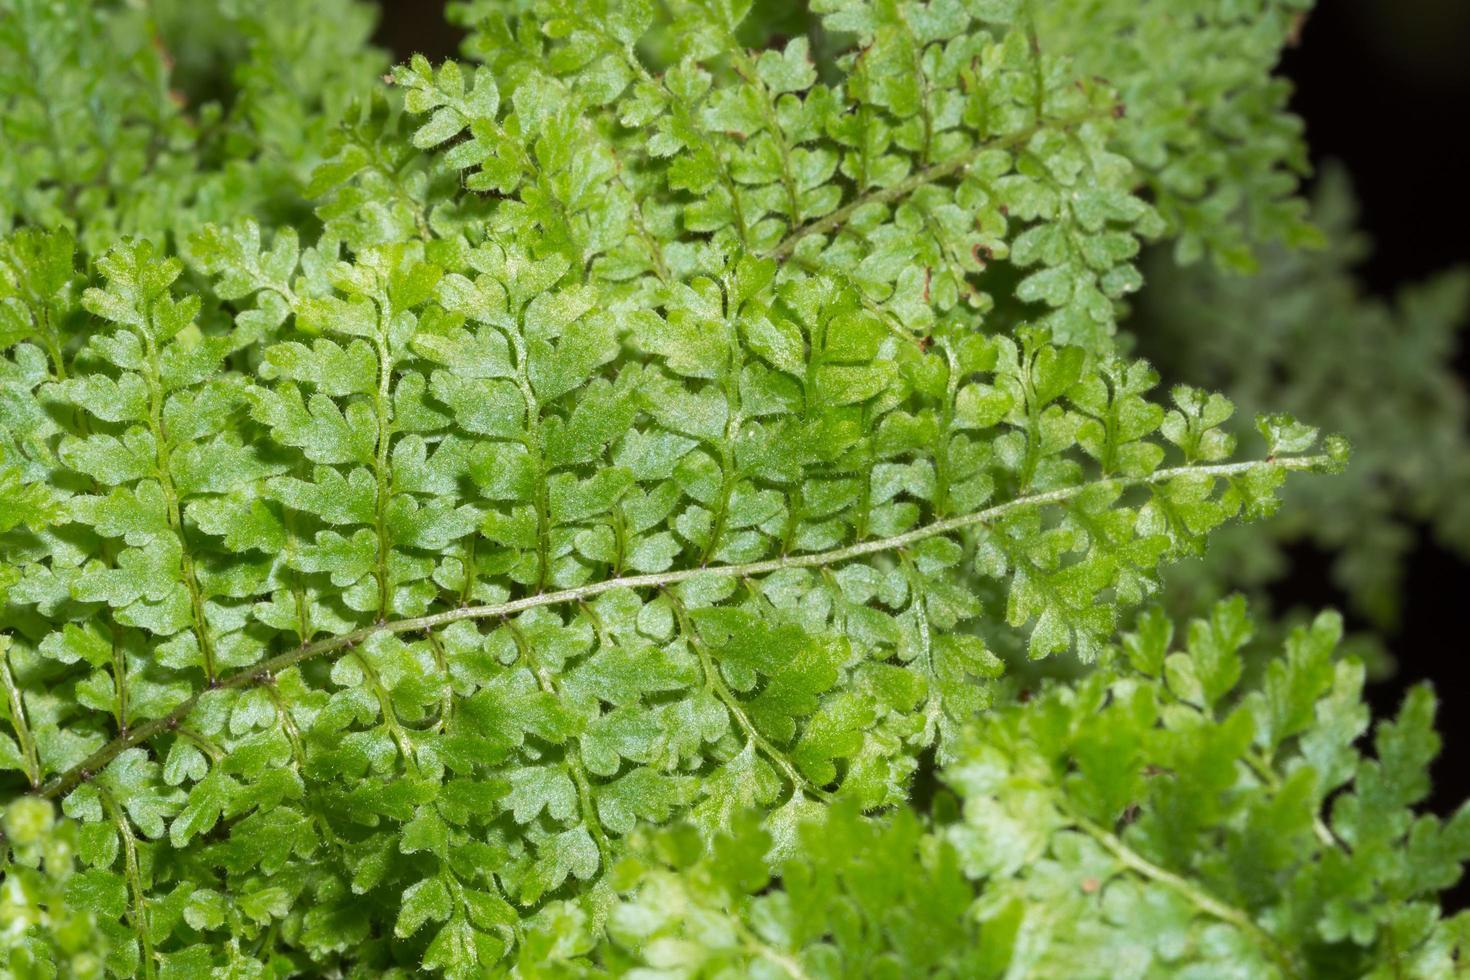 Green fern leaves background photo